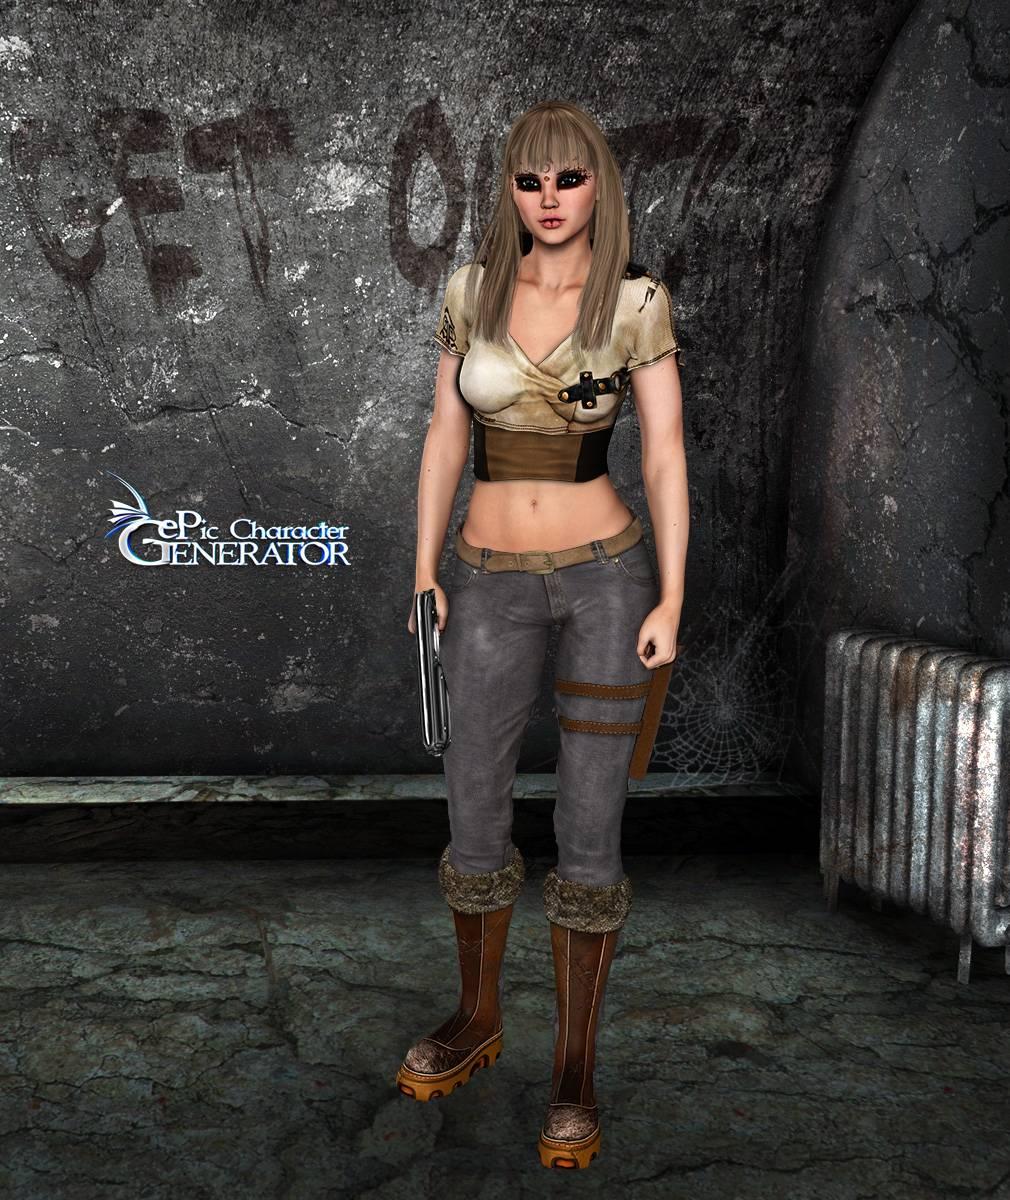 ePic Character Generator Season 2 Female Post Apocalyptic Screenshot 09